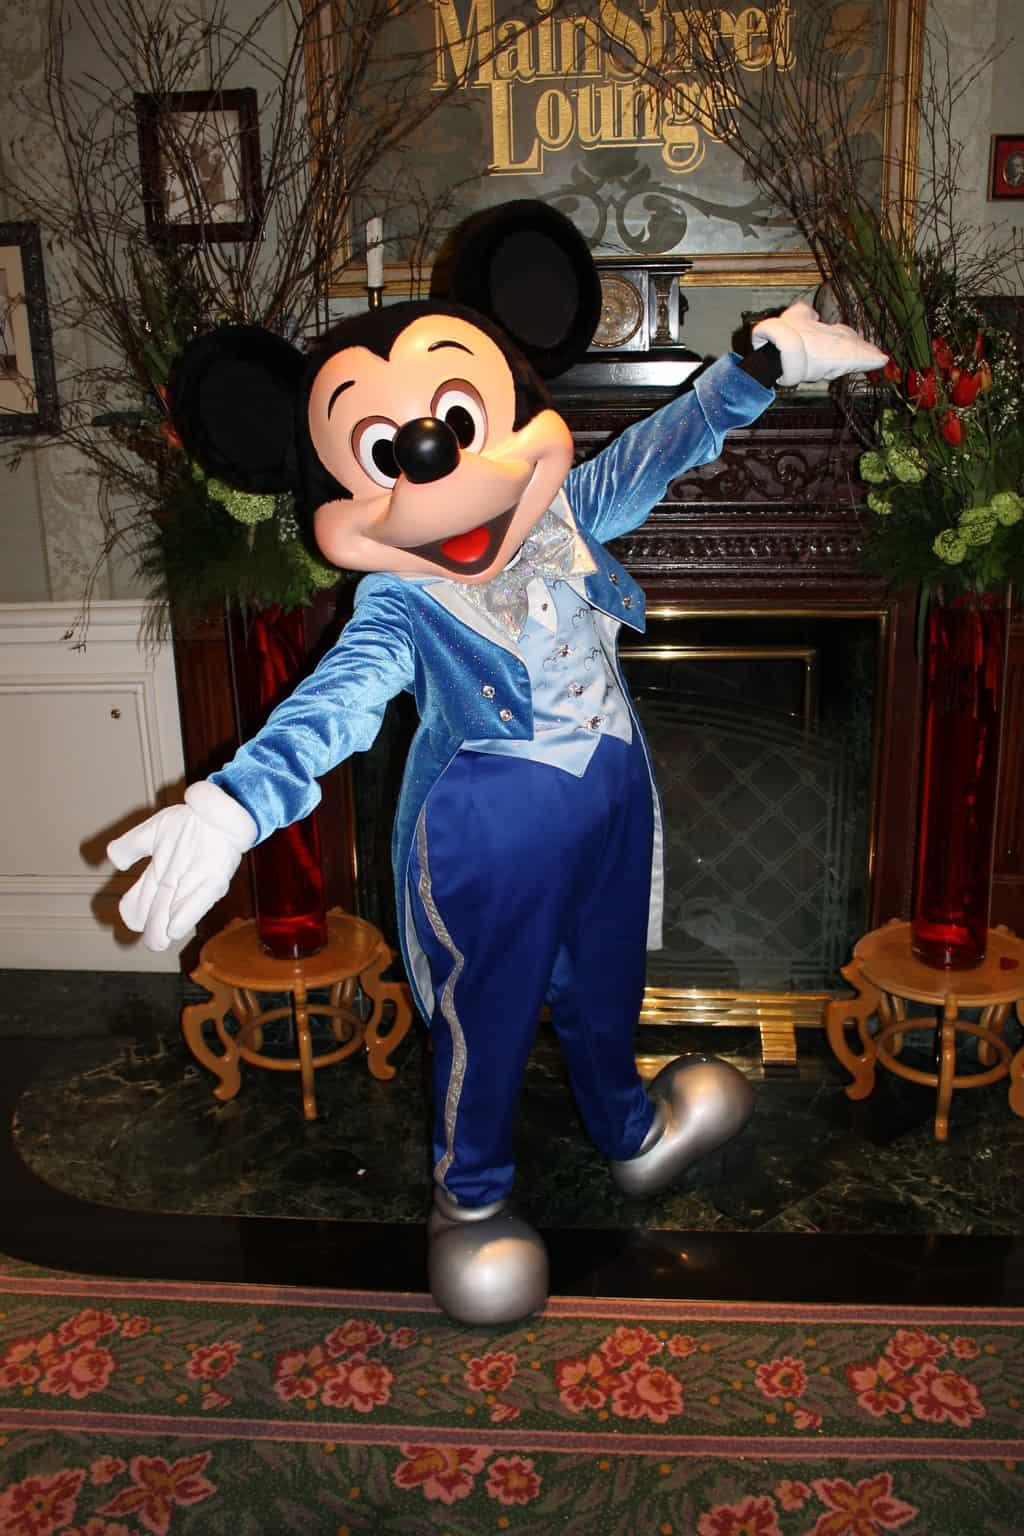 Mickey Mouse Disneyland Paris | KennythePirate.com